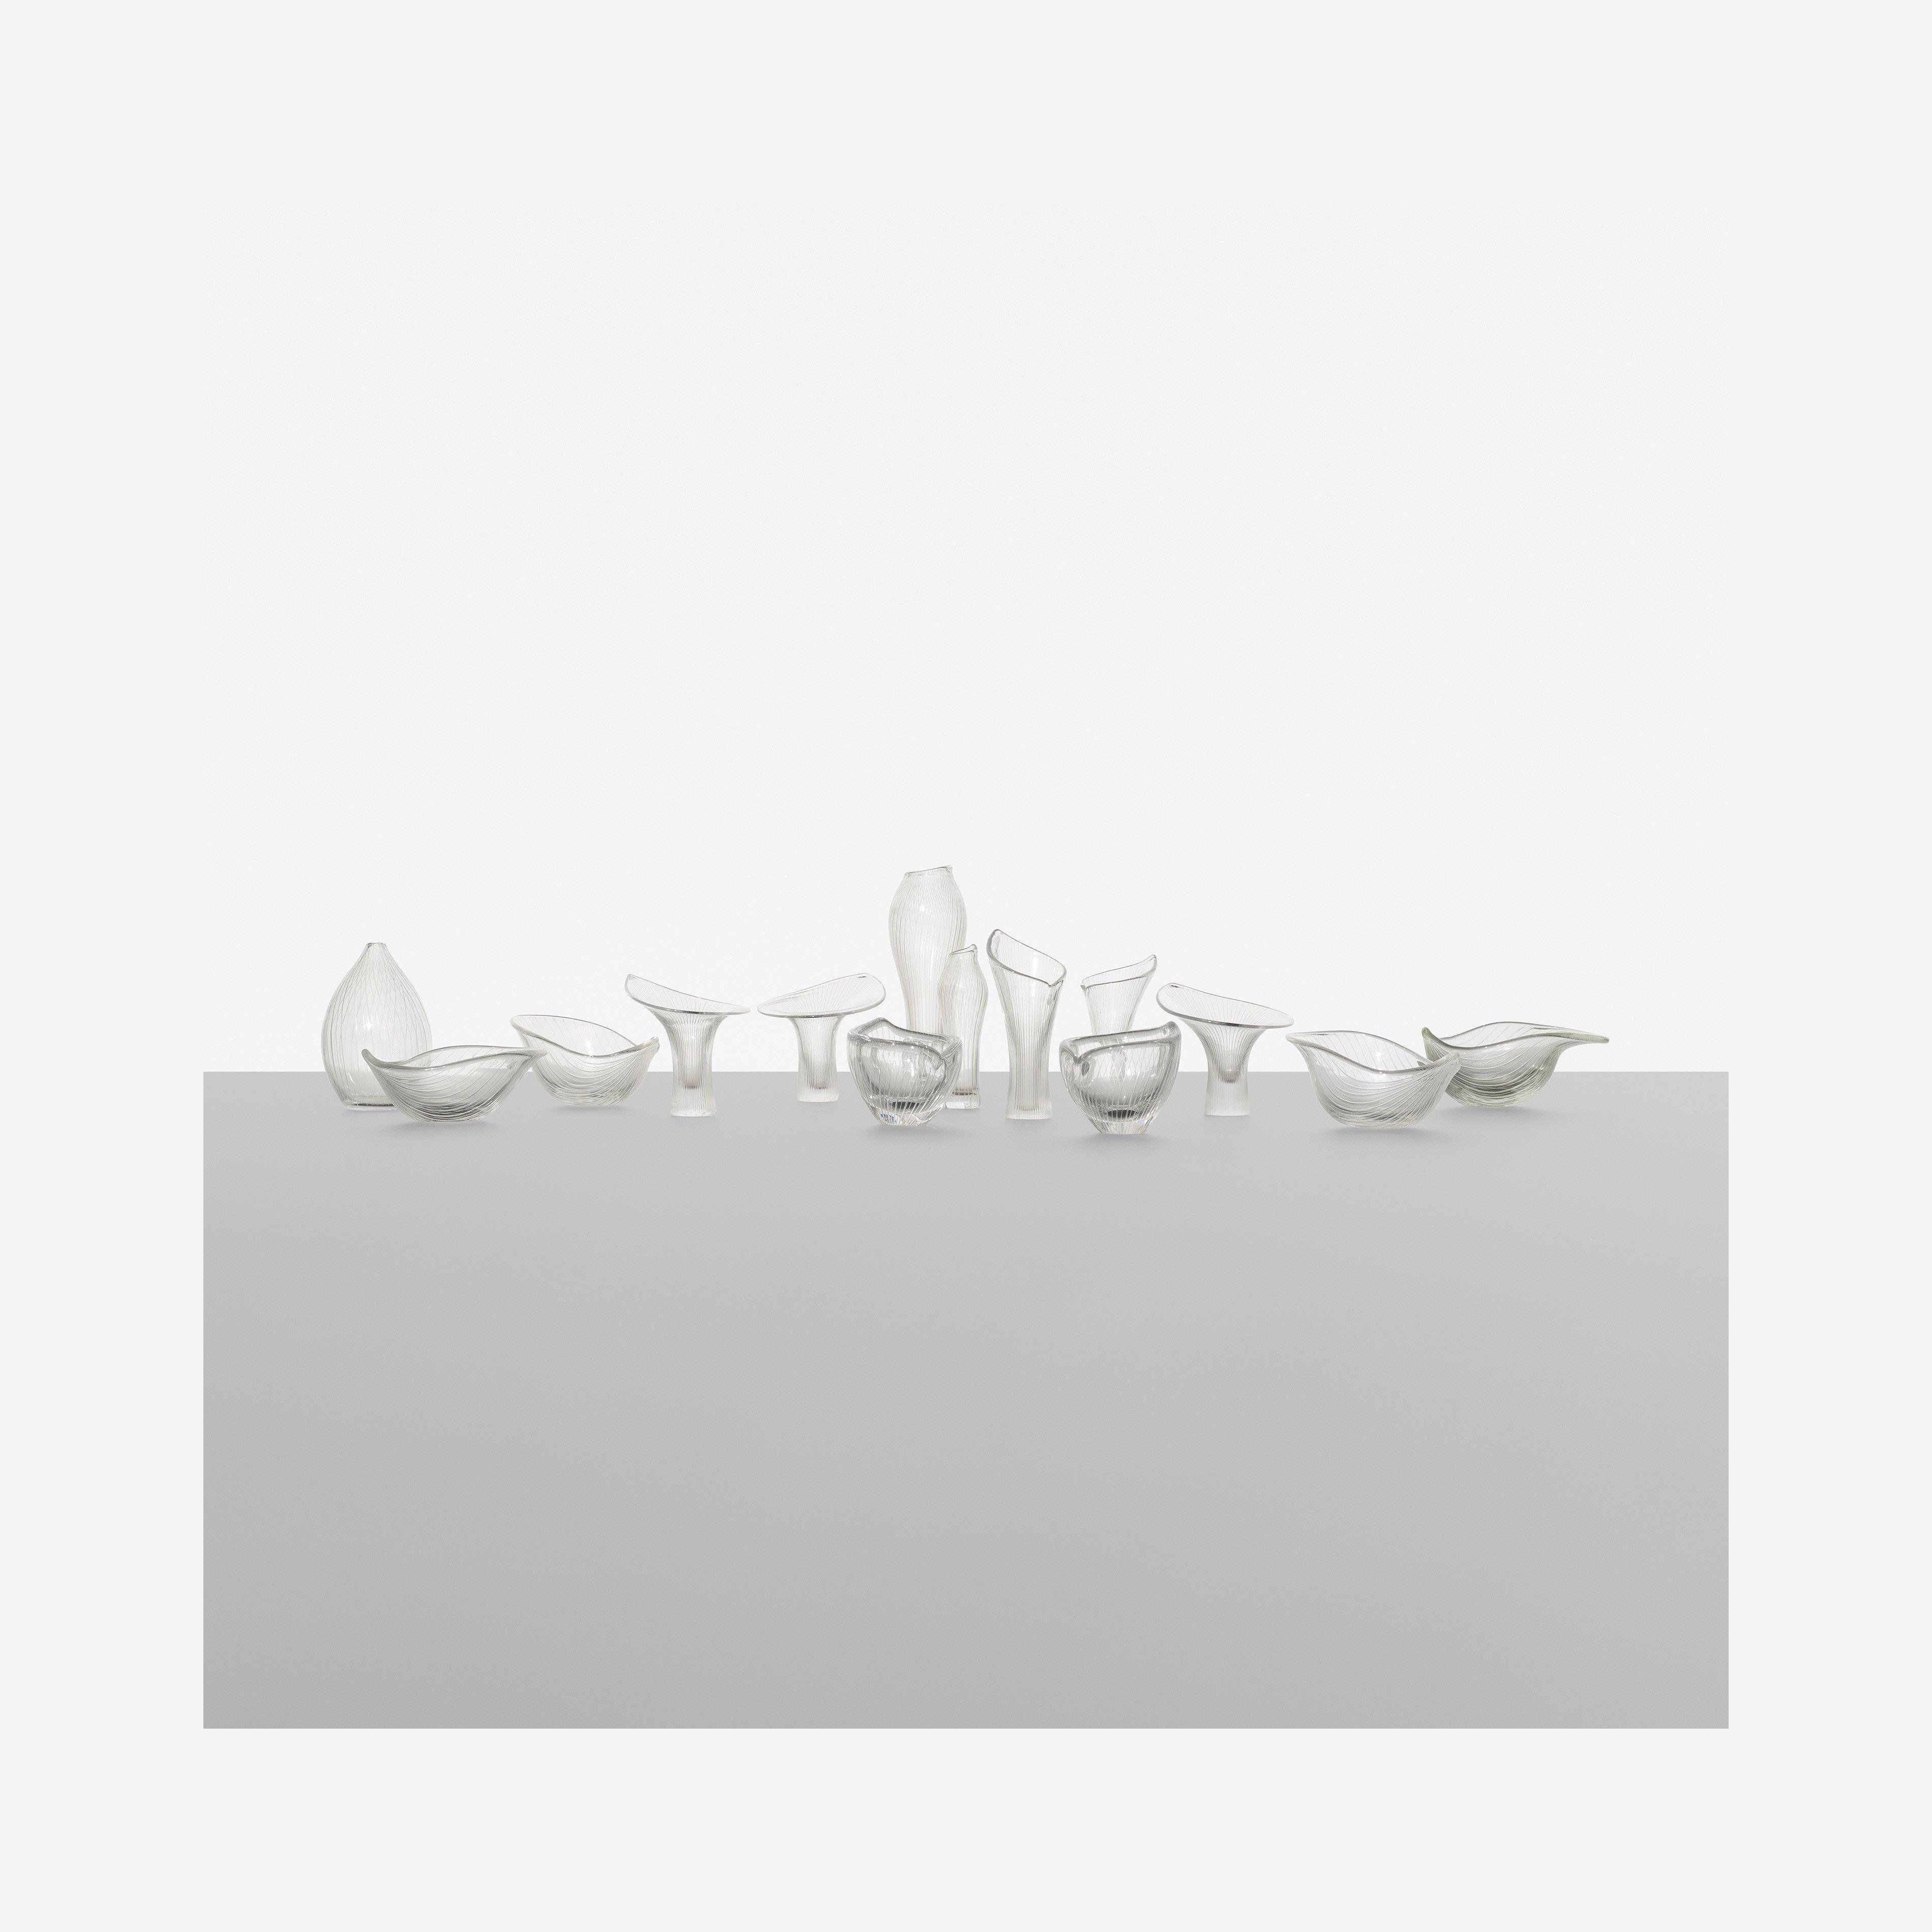 139: Tapio Wirkkala / collection of fourteen vessels < Scandinavian Design, 5 November 2015 < Auctions | Wright